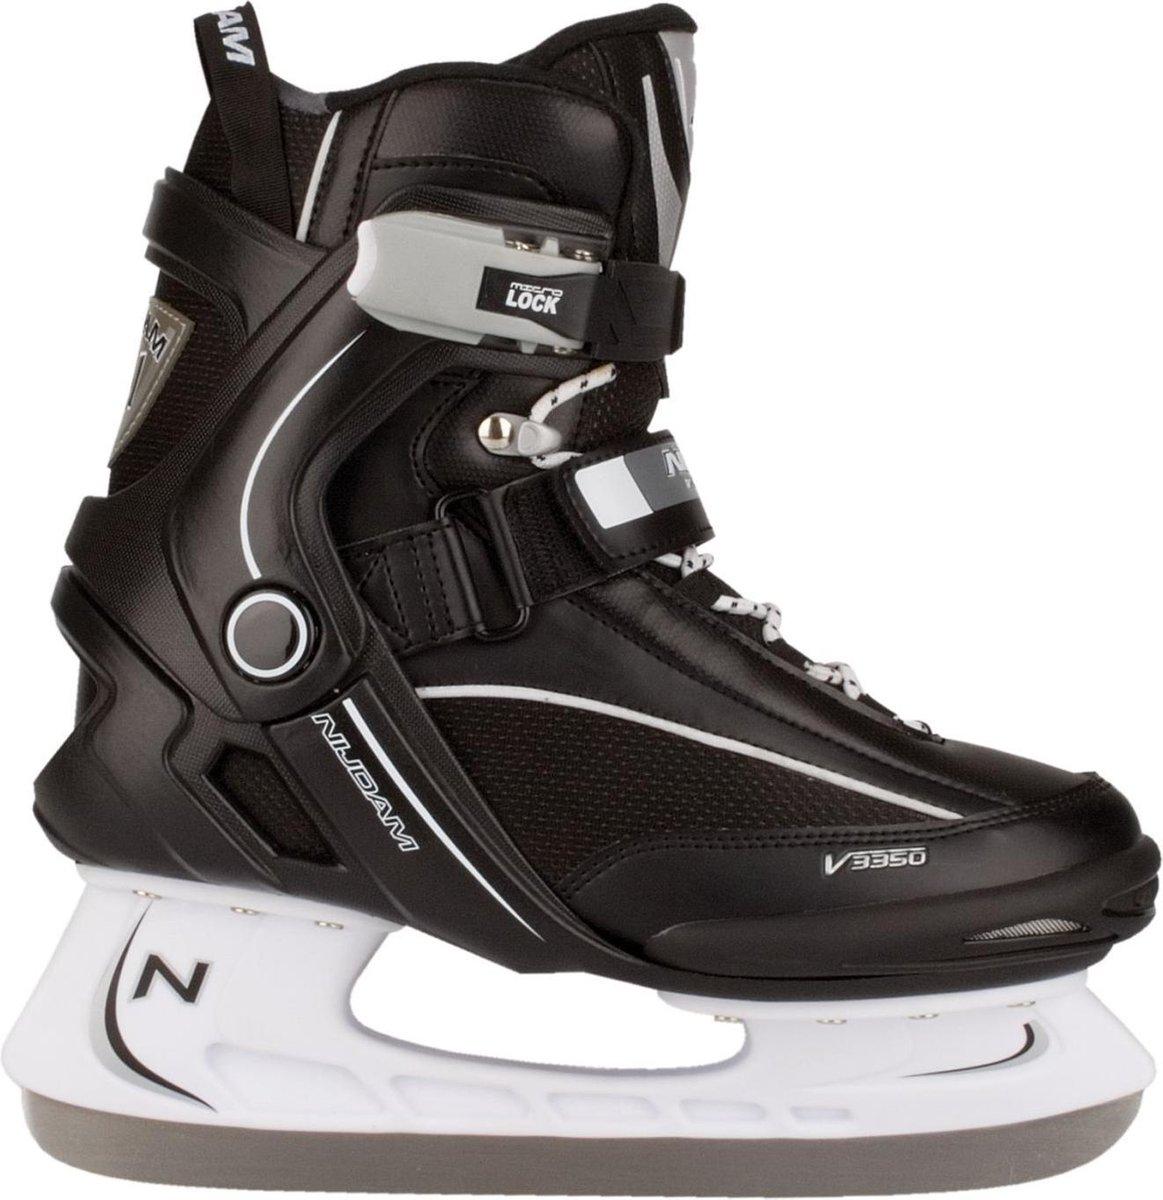 Nijdam IJshockeyschaats - Semi-Softboot - Zwart/Wit - Maat 42